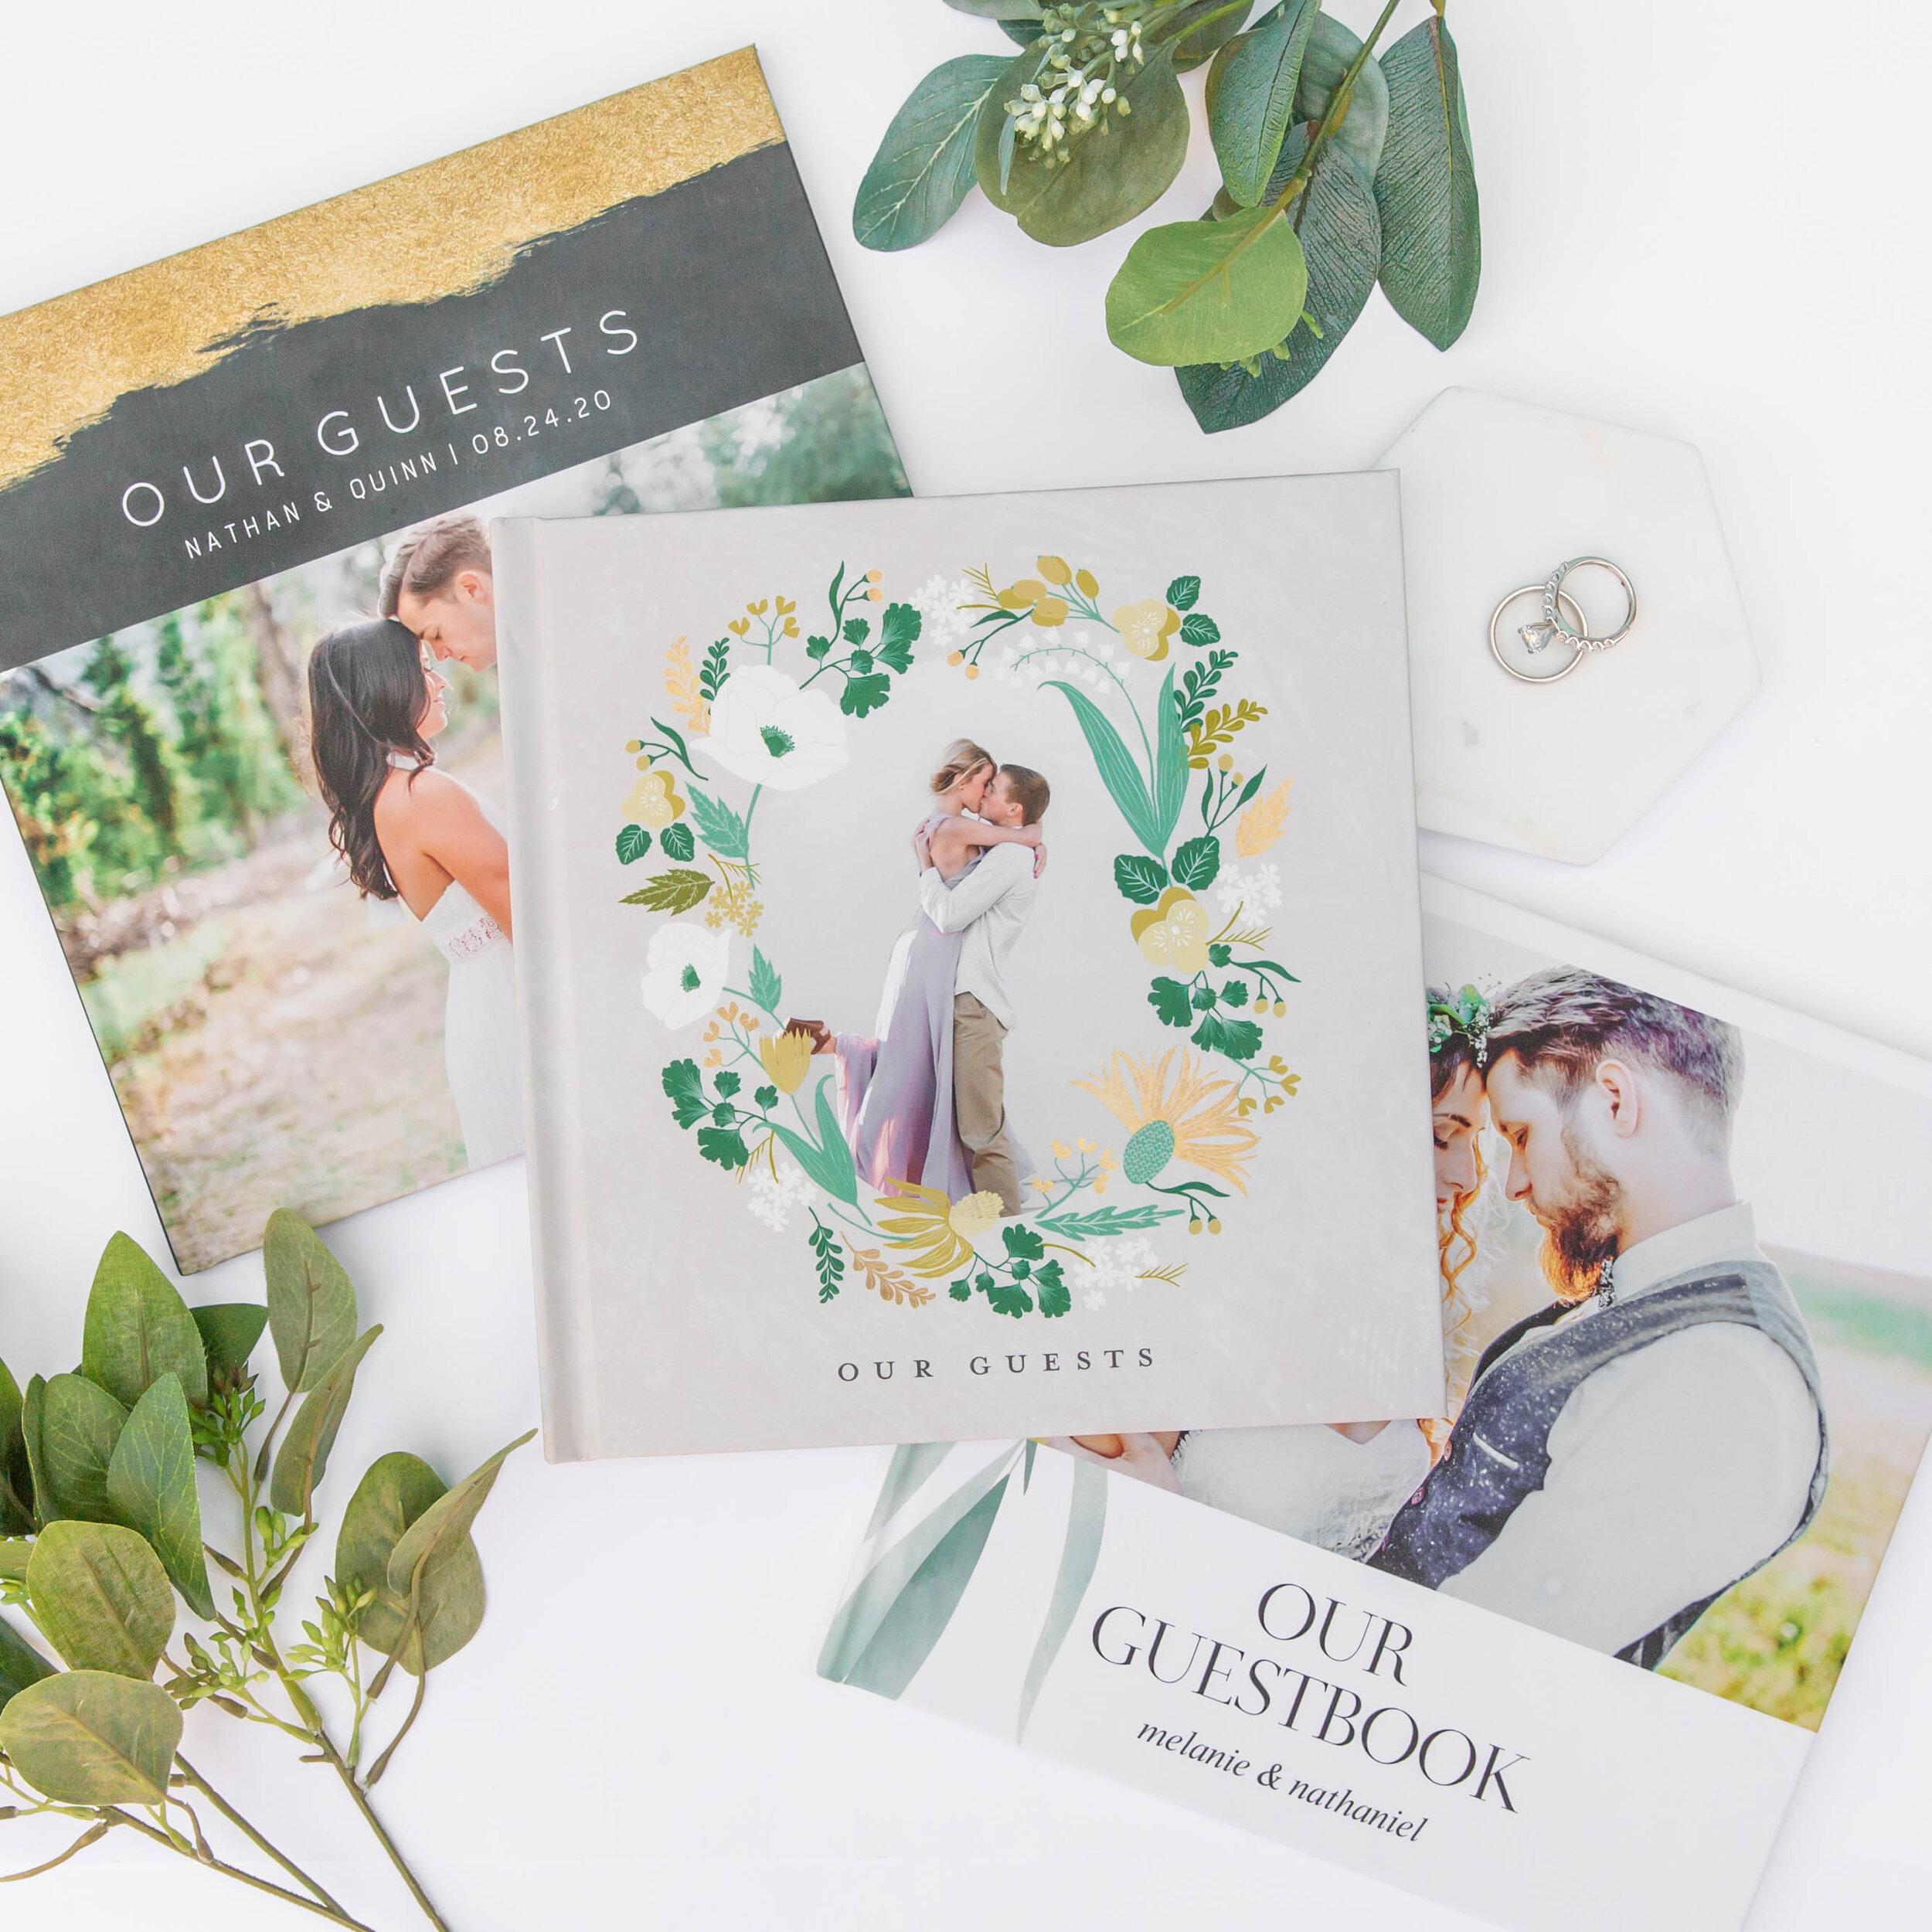 17 Unique Wedding Guest Book Ideas Mixbook Inspiration